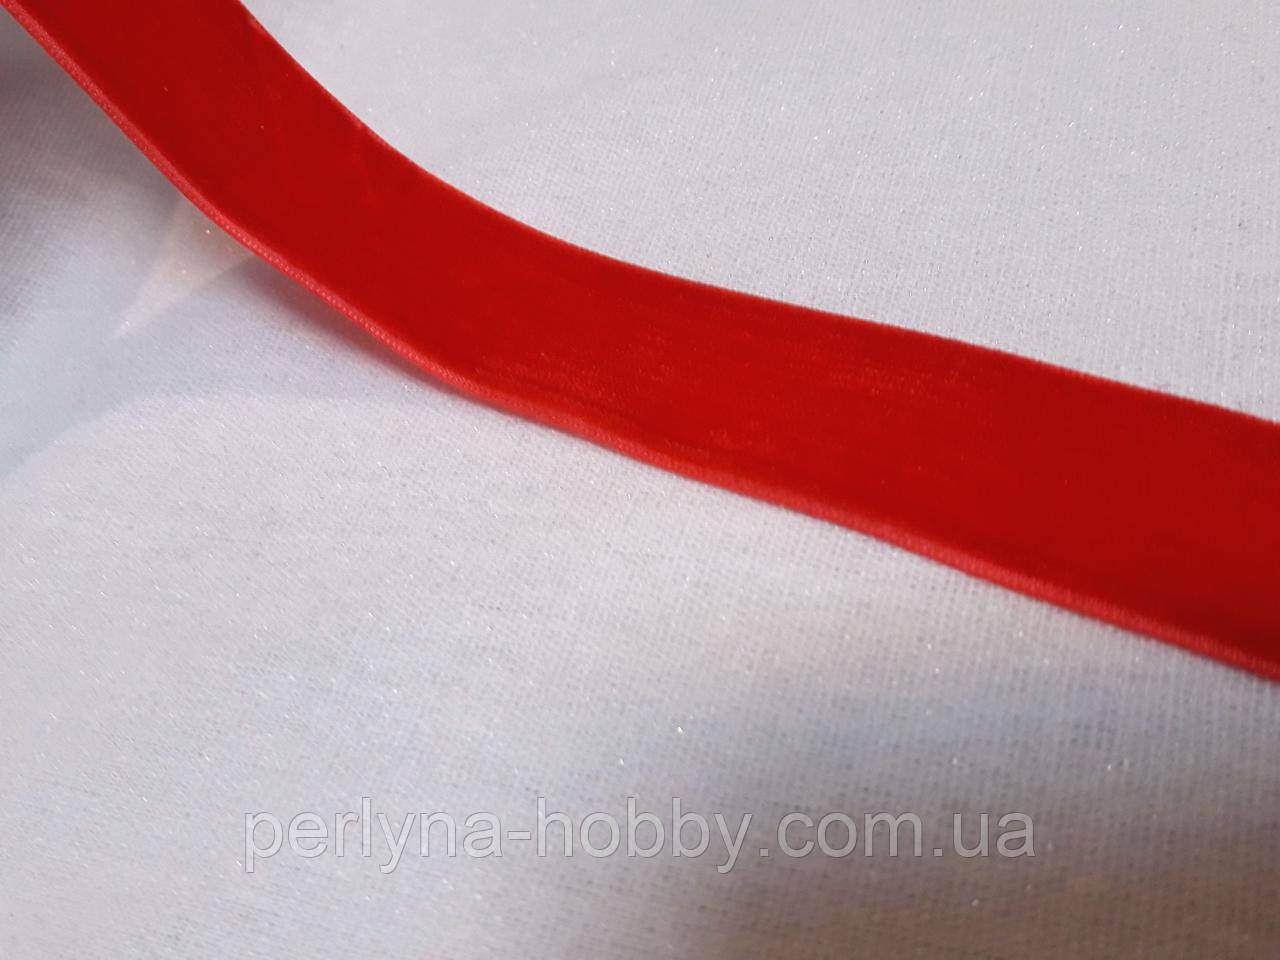 Стрічка оксамитова Лента бархатная (бархатка) 2,5см, червона яскрава